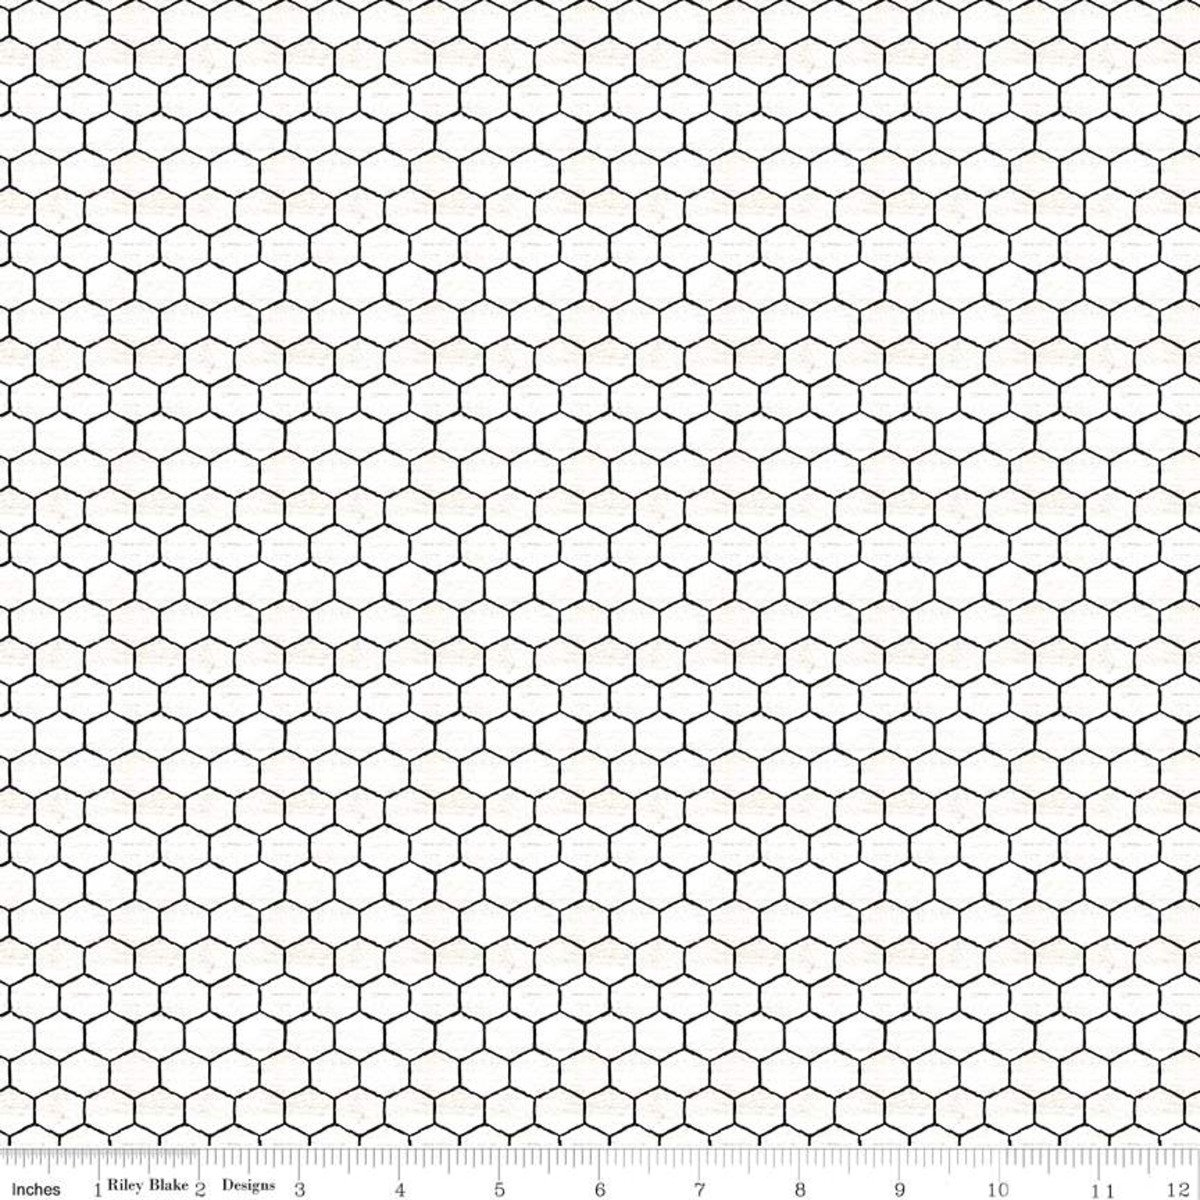 Bees Life C10104 Honeycomb Parchment